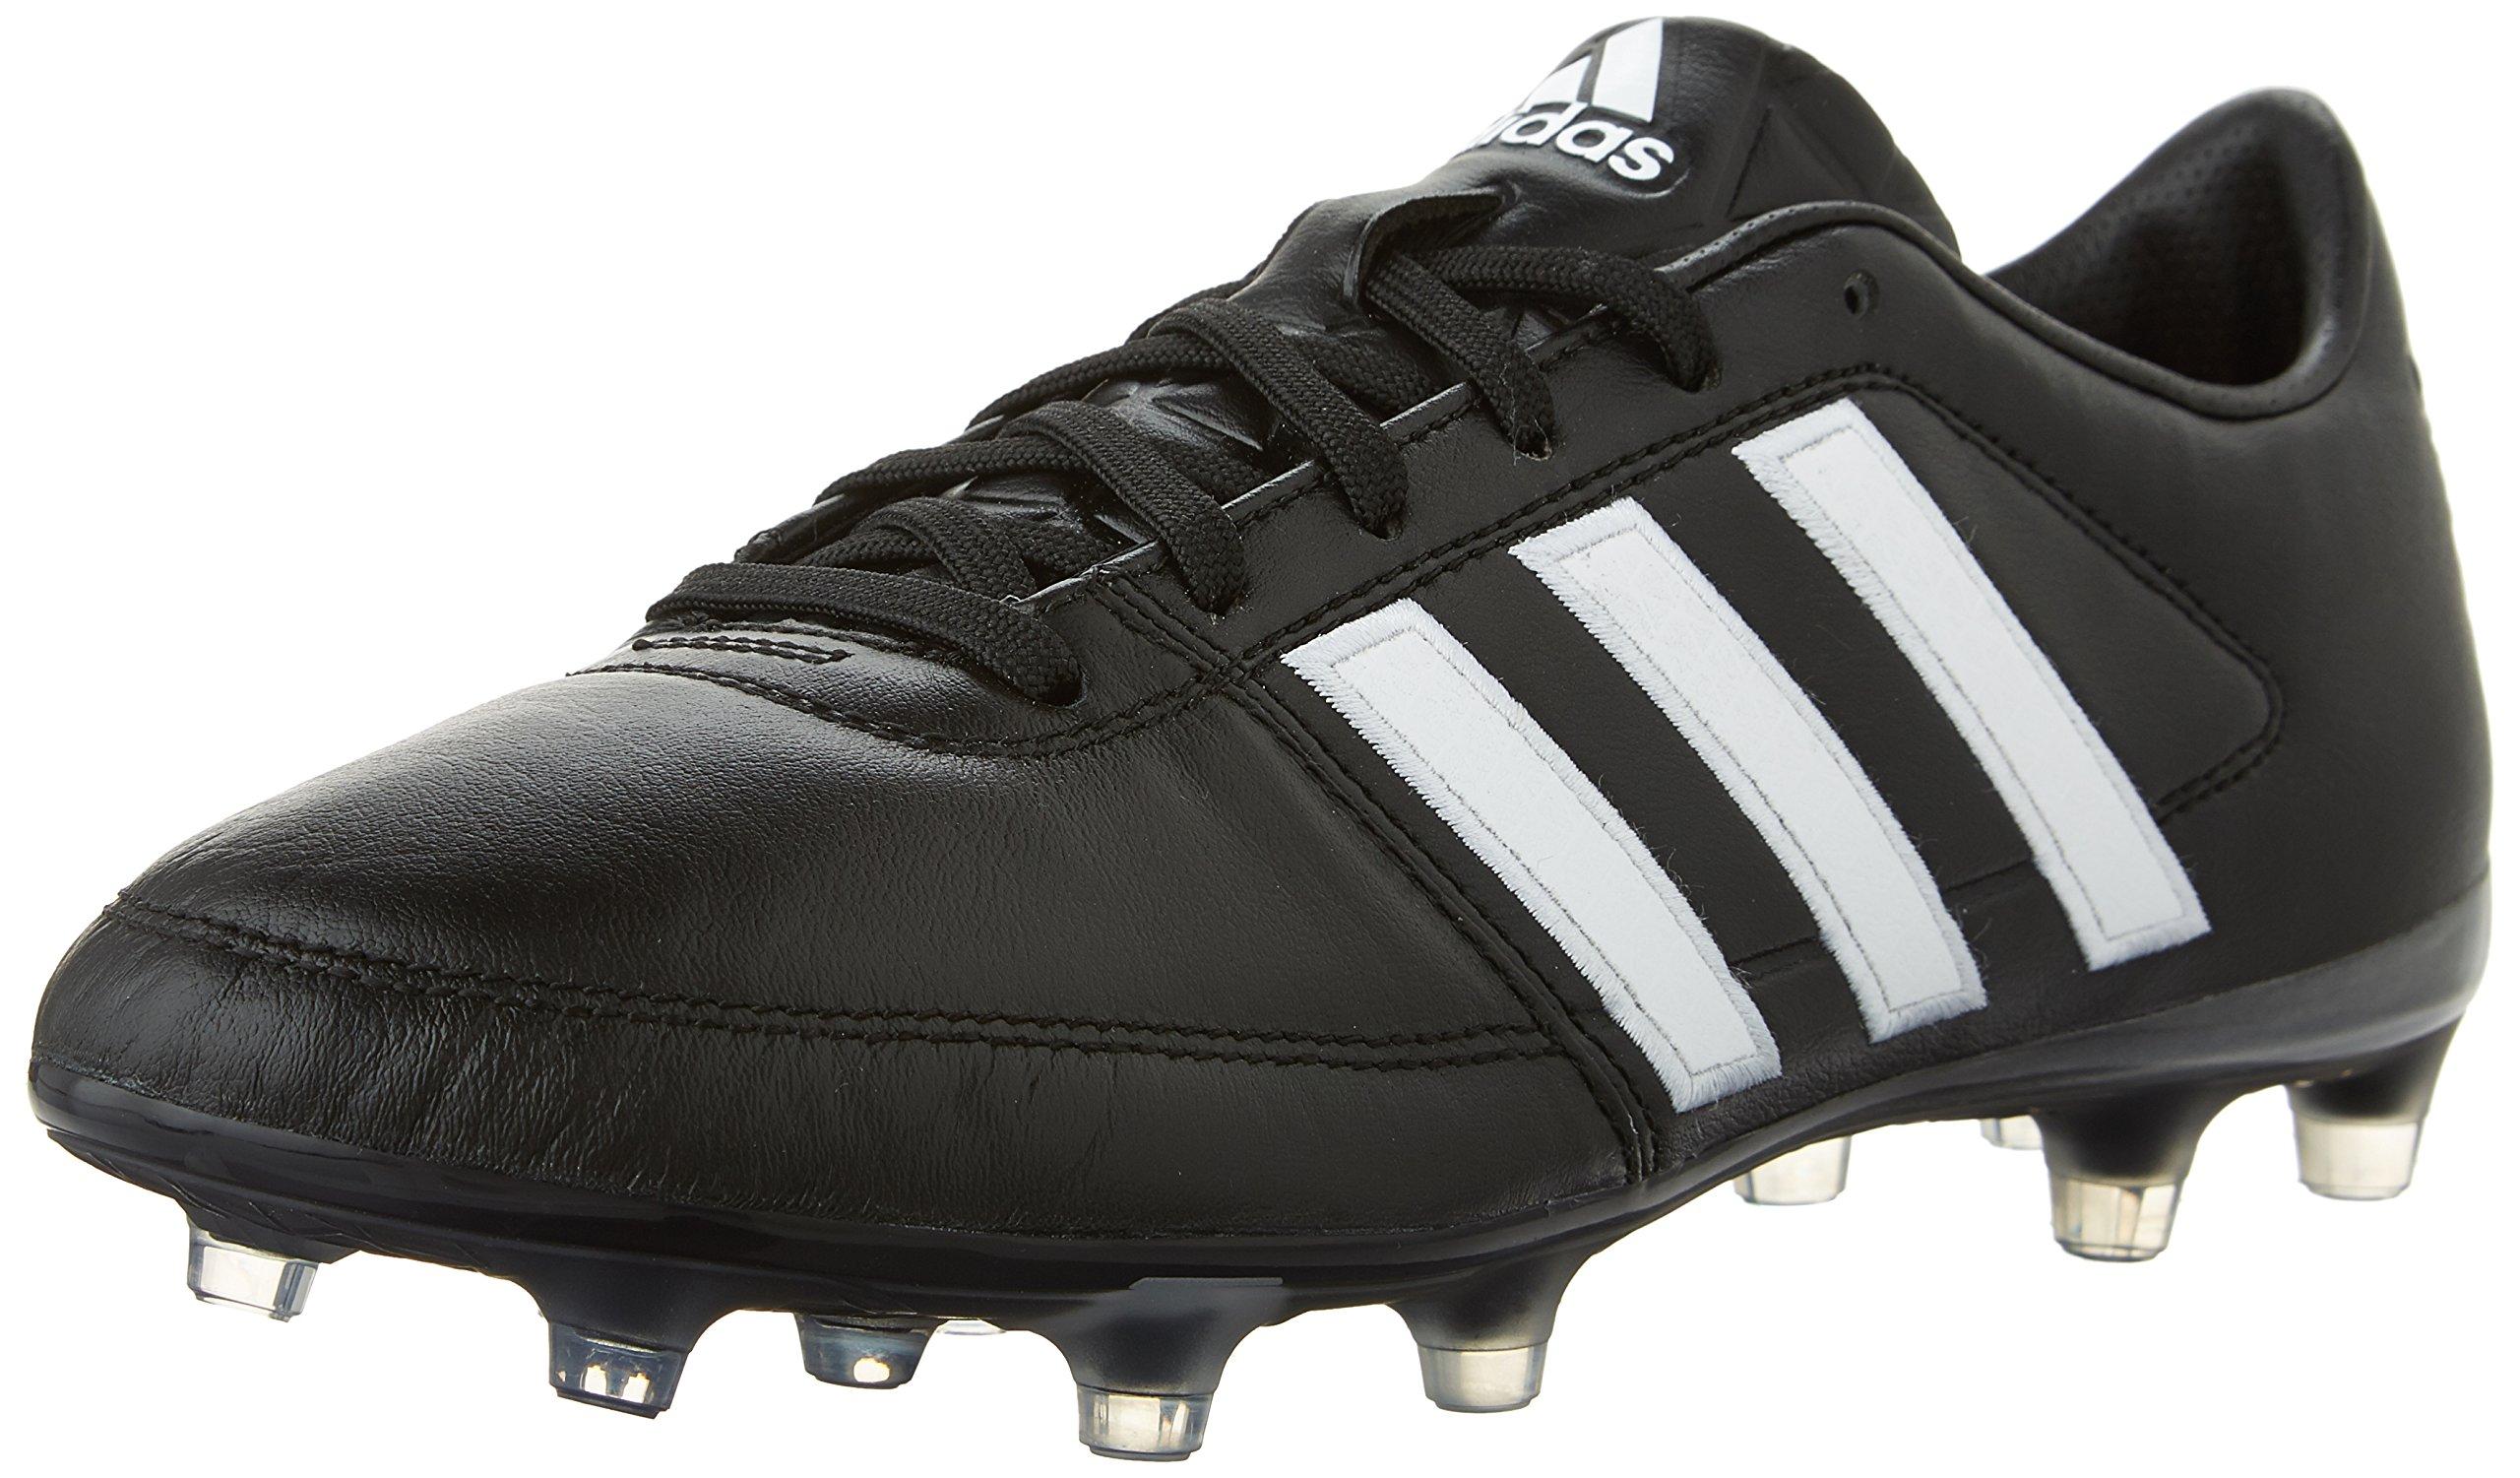 adidas Performance Men's Gloro 16.1 FG Soccer Cleat, Black/White/Metallic Silver, 4.5 M US